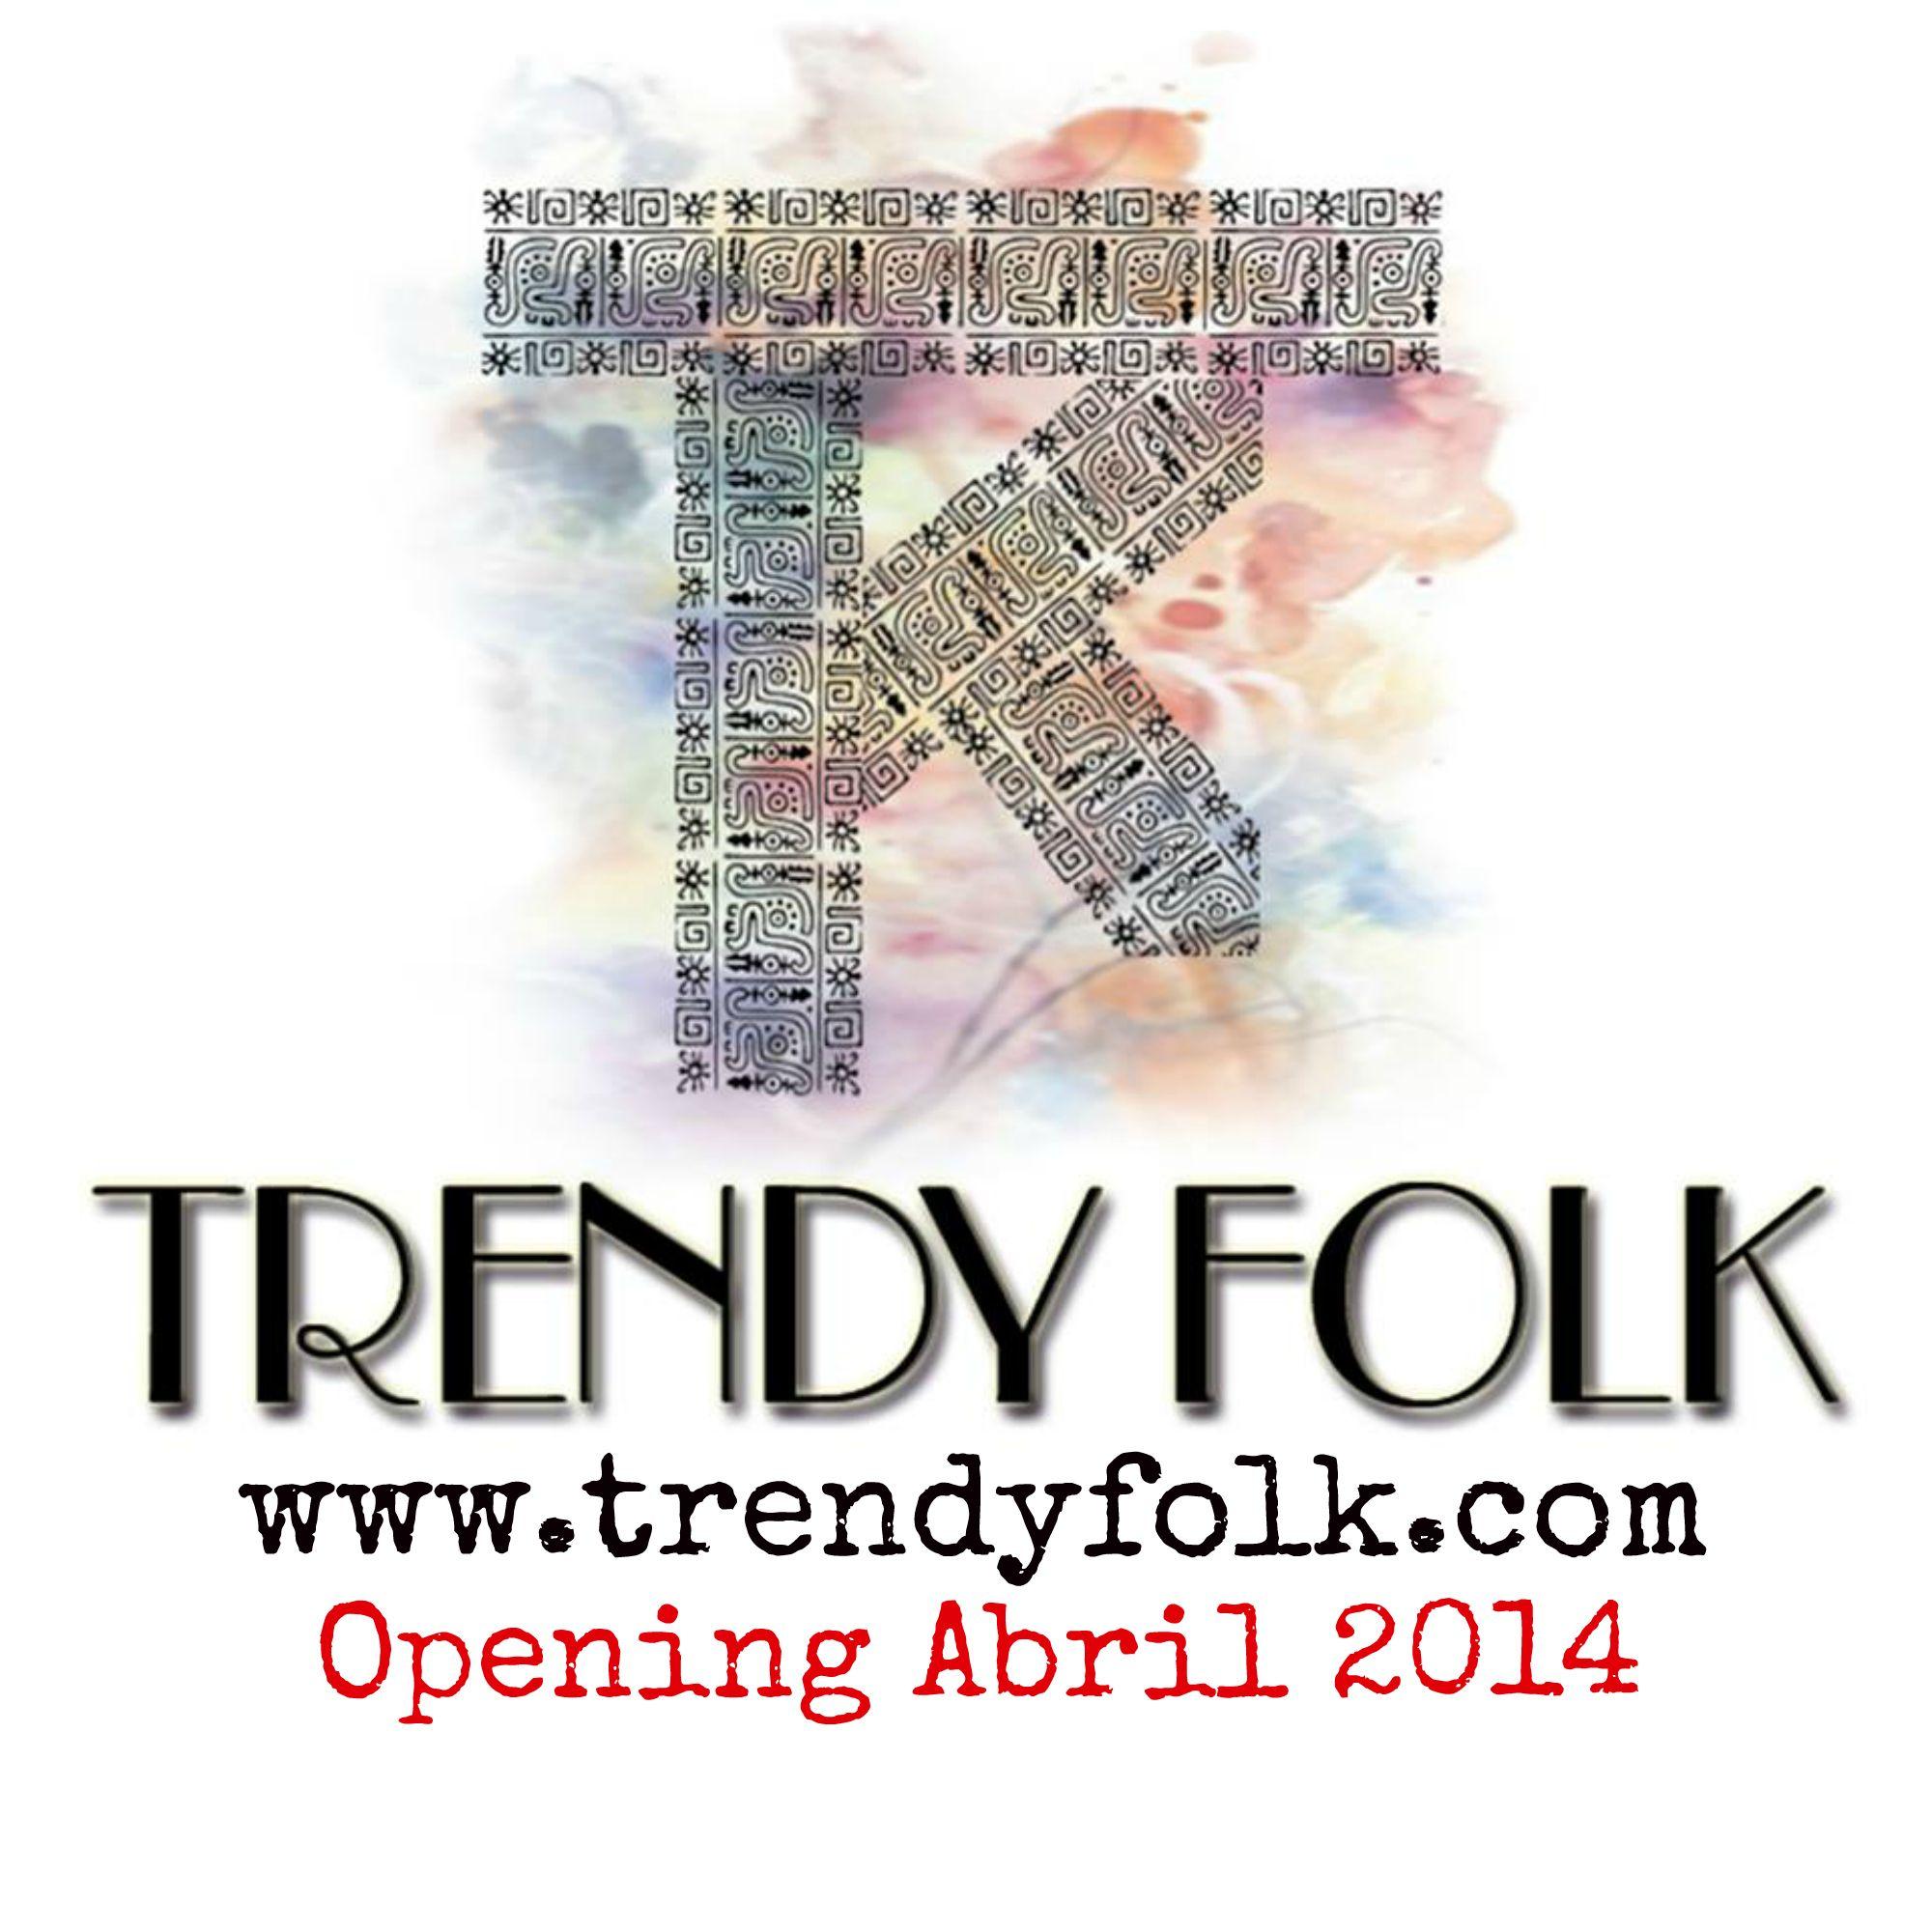 Trendy Folk Abril 2014 opening apertura moda mexicana arte mexicano tienda en linea online store